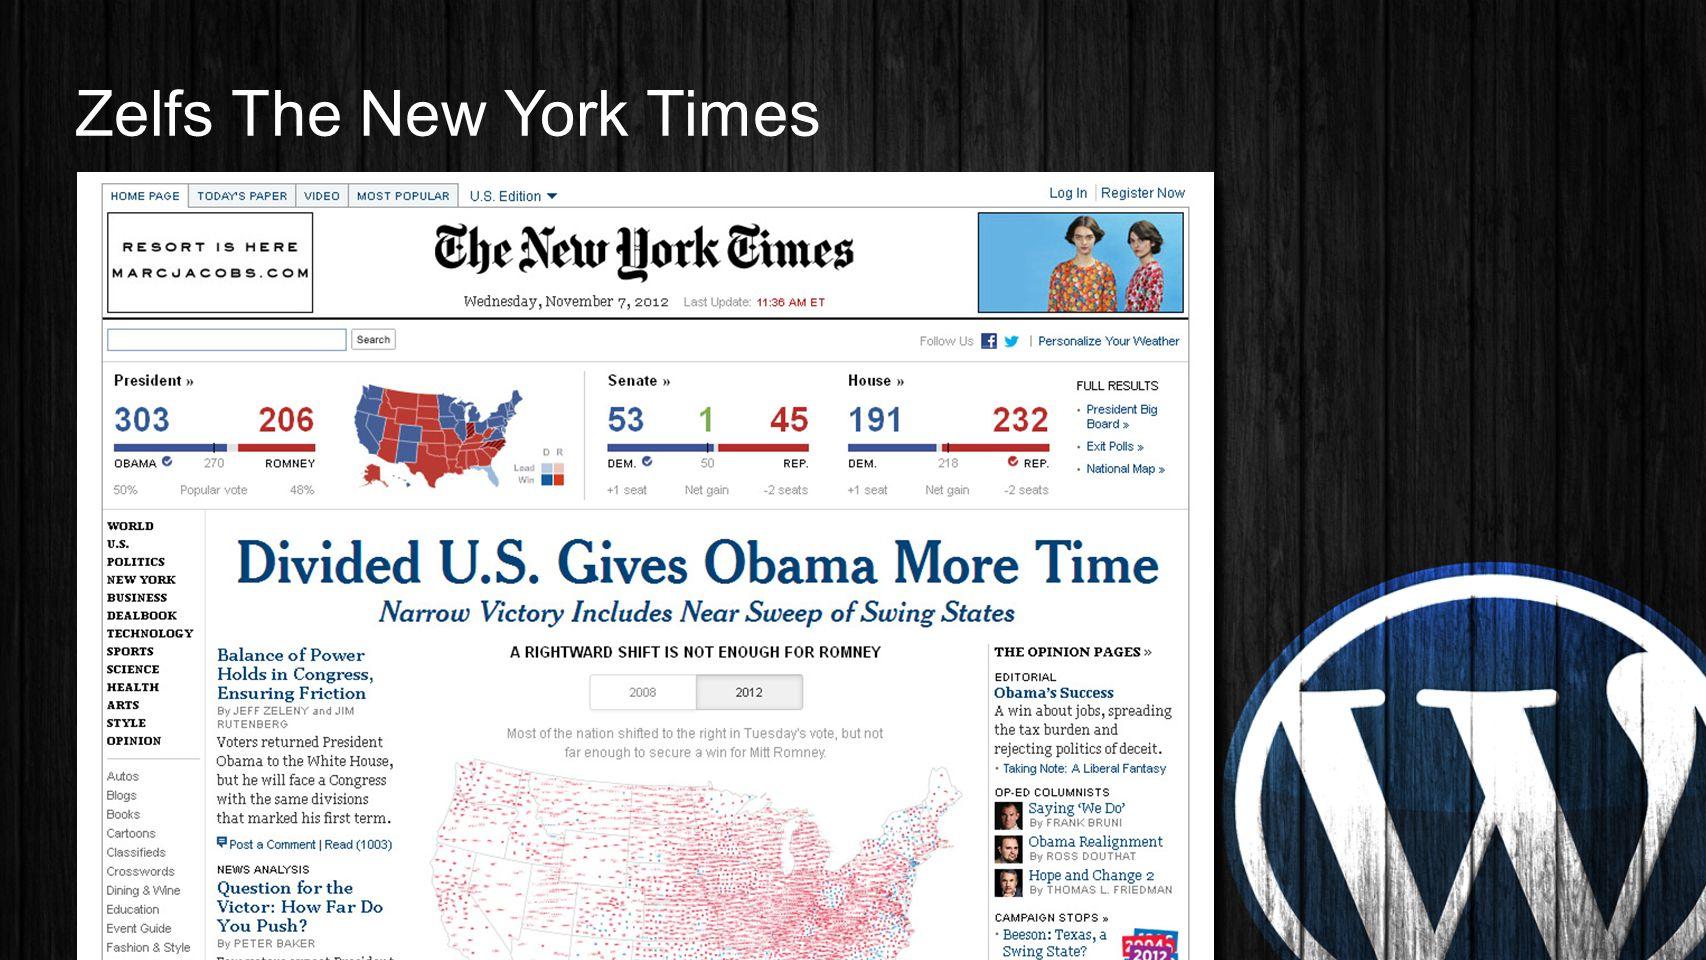 Zelfs The New York Times